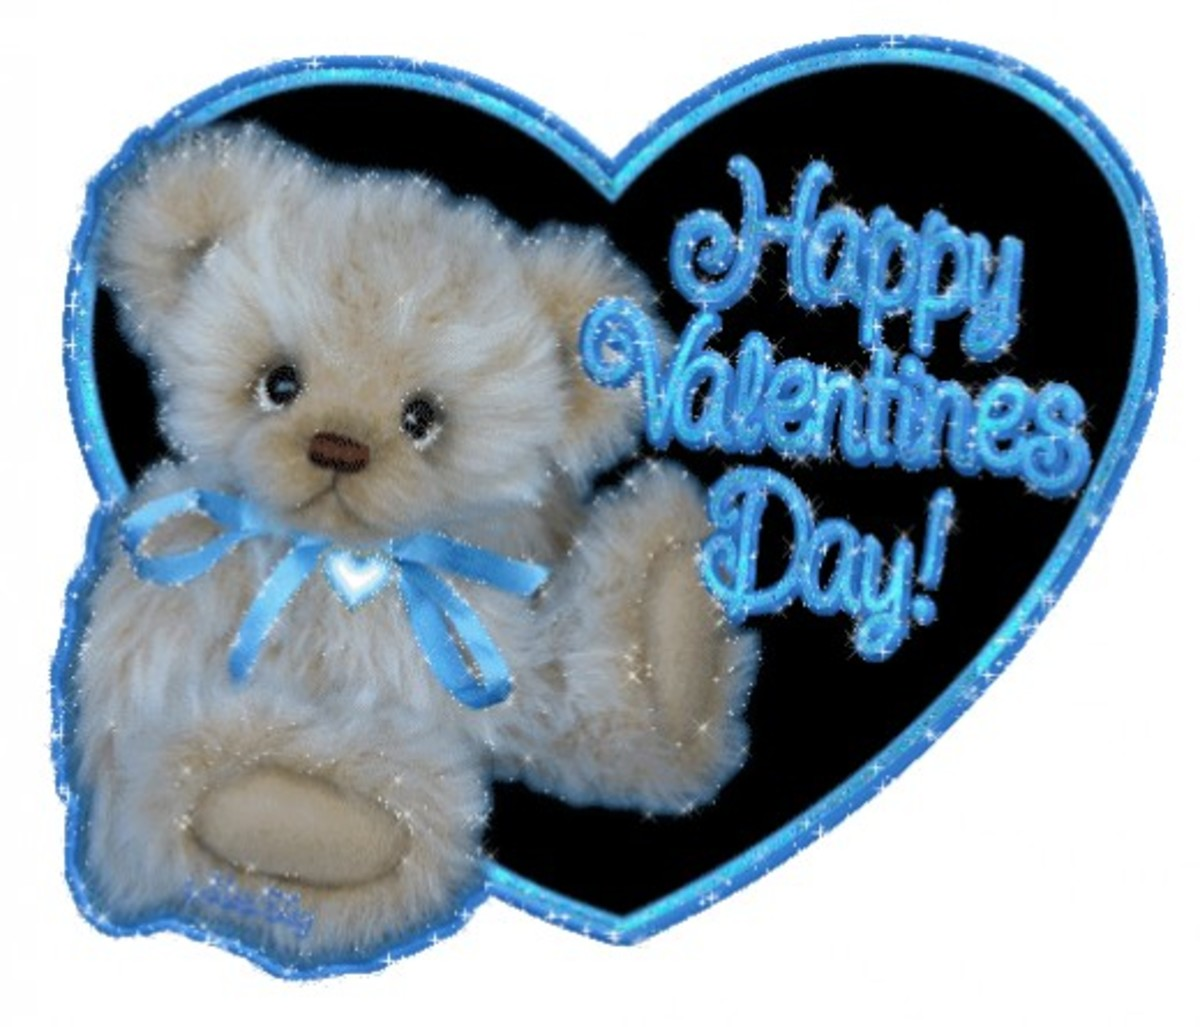 White Teddy Bear with Happy Valentine's Day